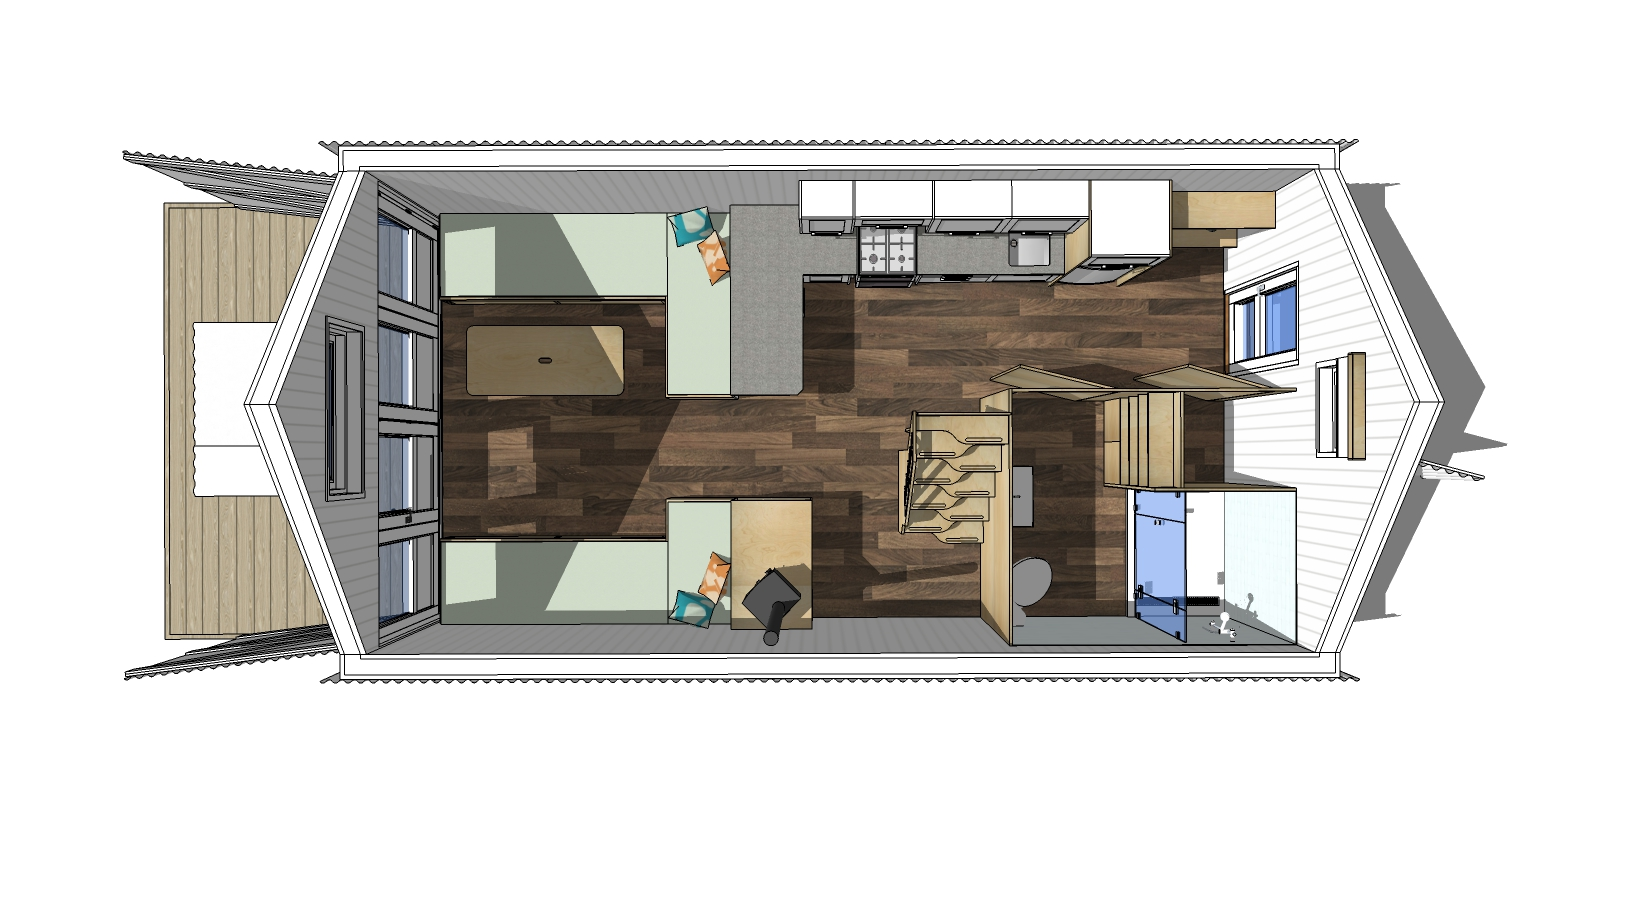 cadland estate 2x huts - 3.jpg